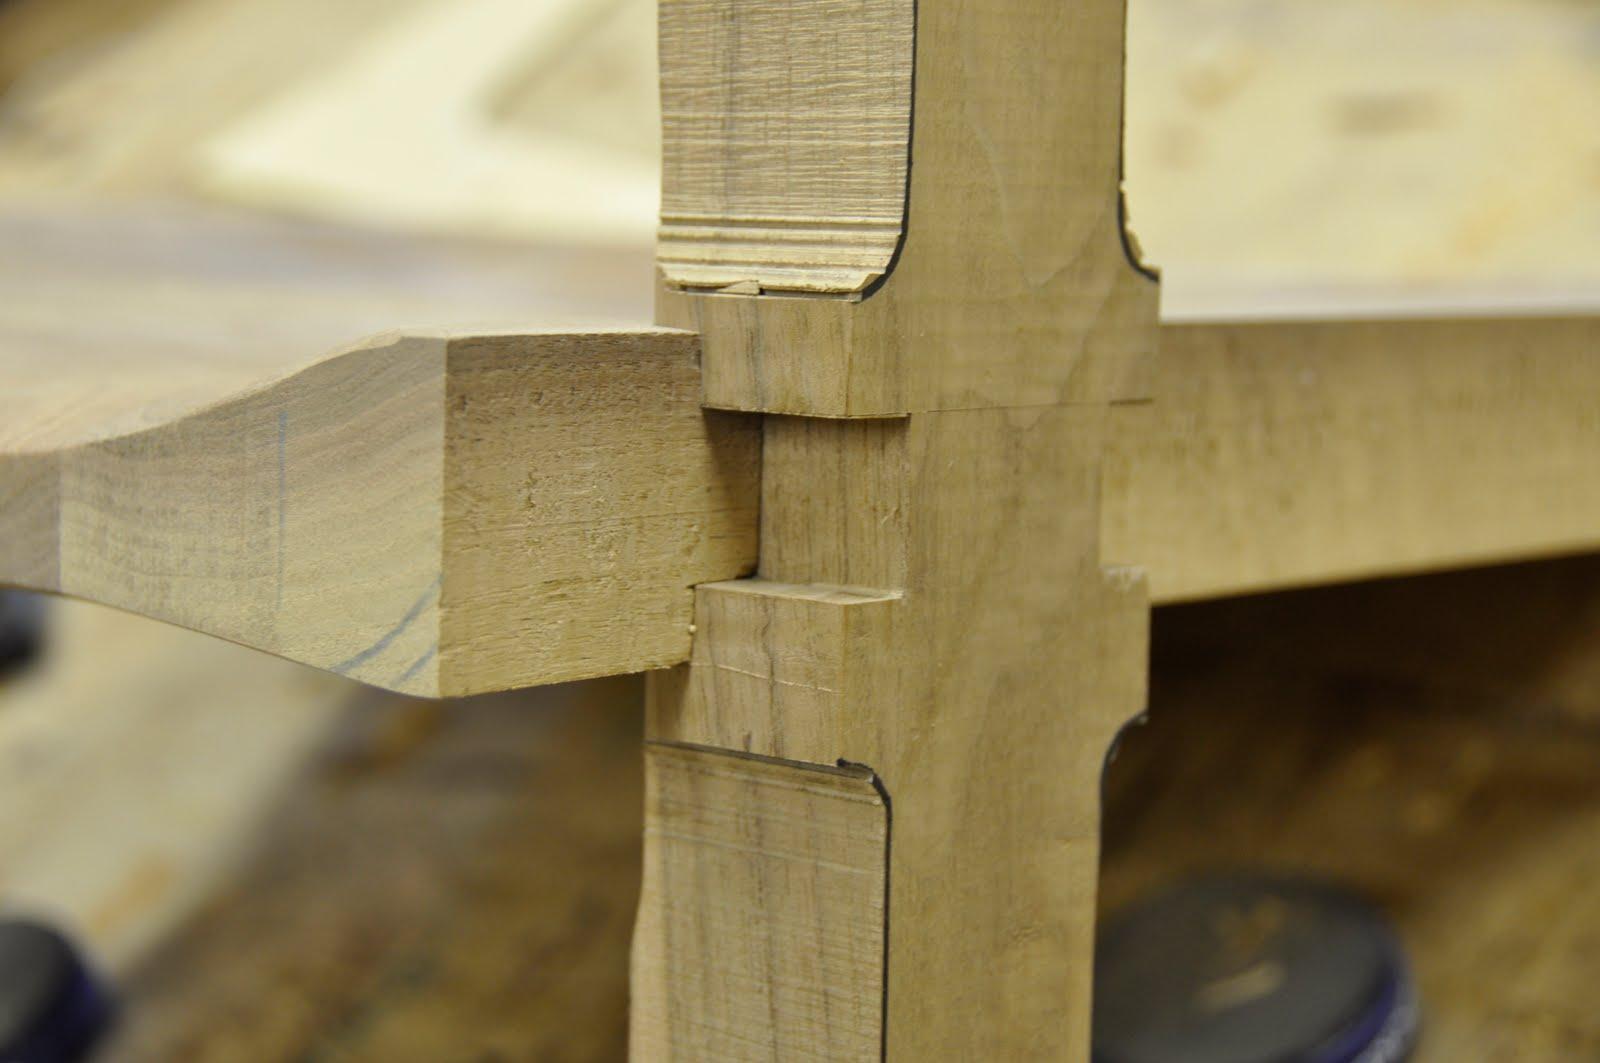 sam maloof rocking chair plans pdf | download wood plans